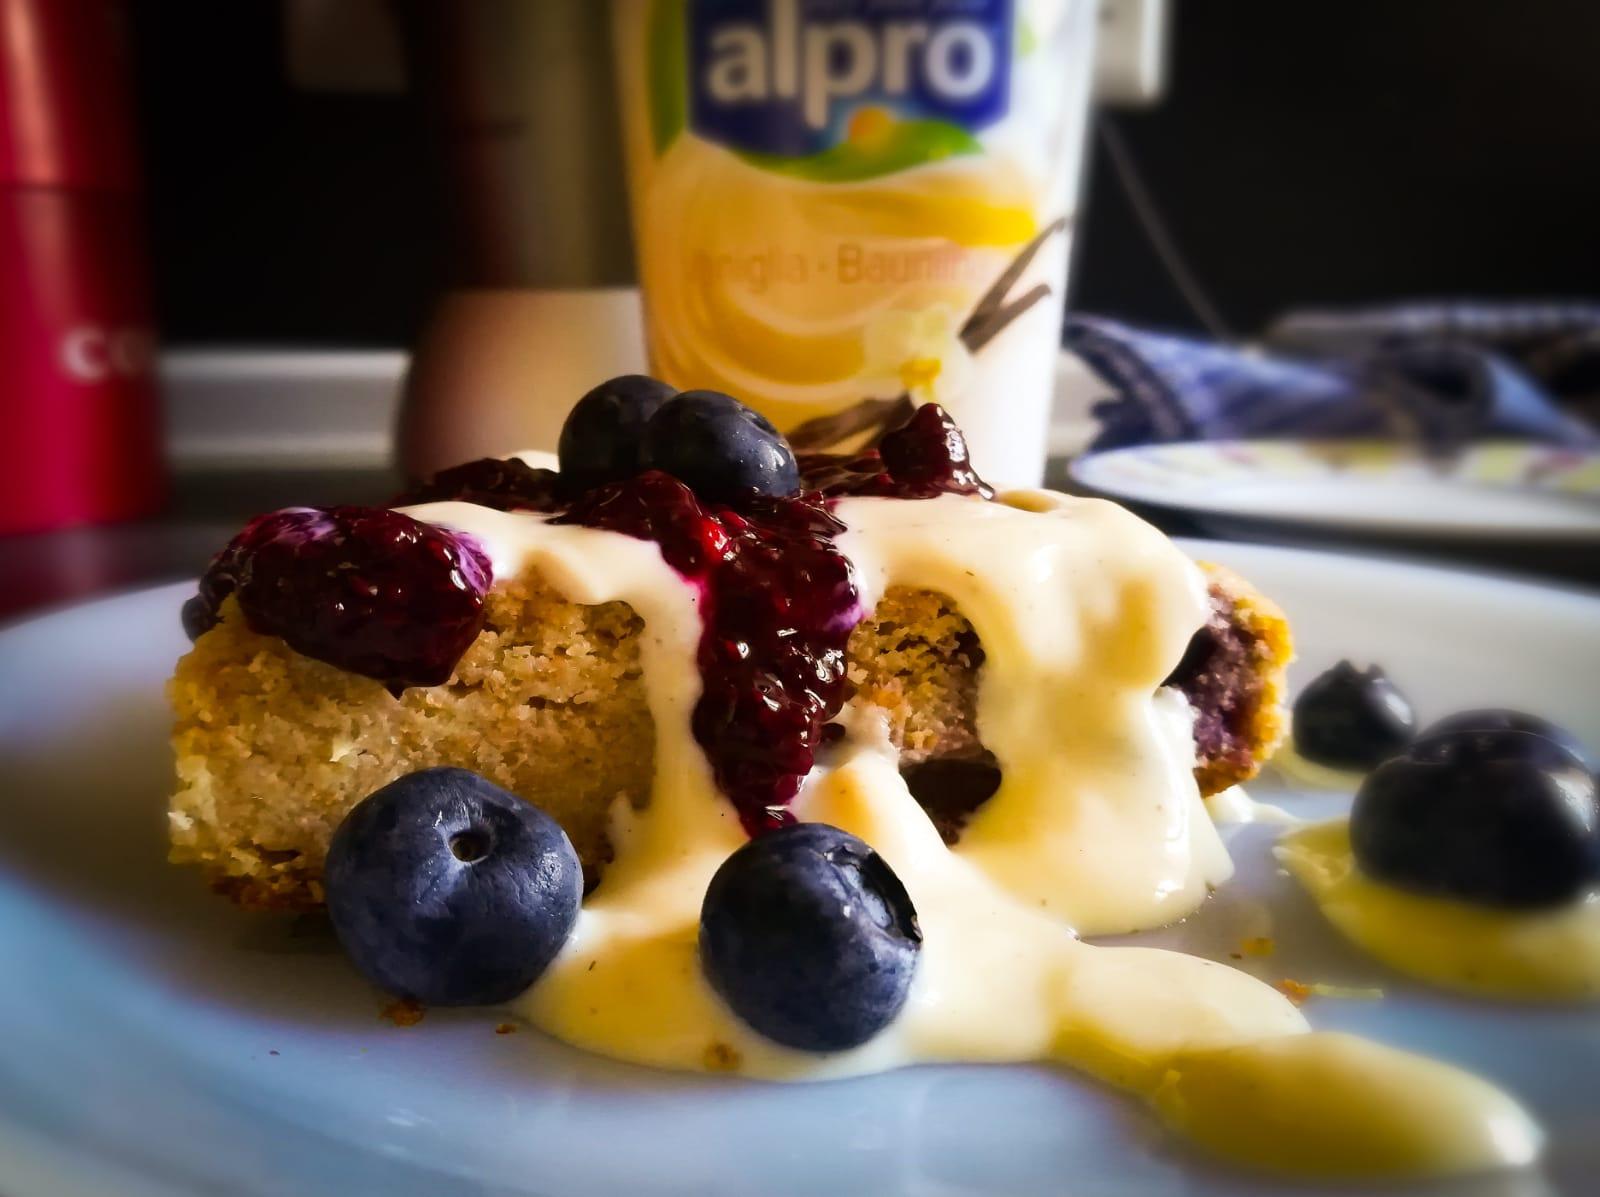 ramona debono Lemon Blueberry Yoghurt Blender Cake ready